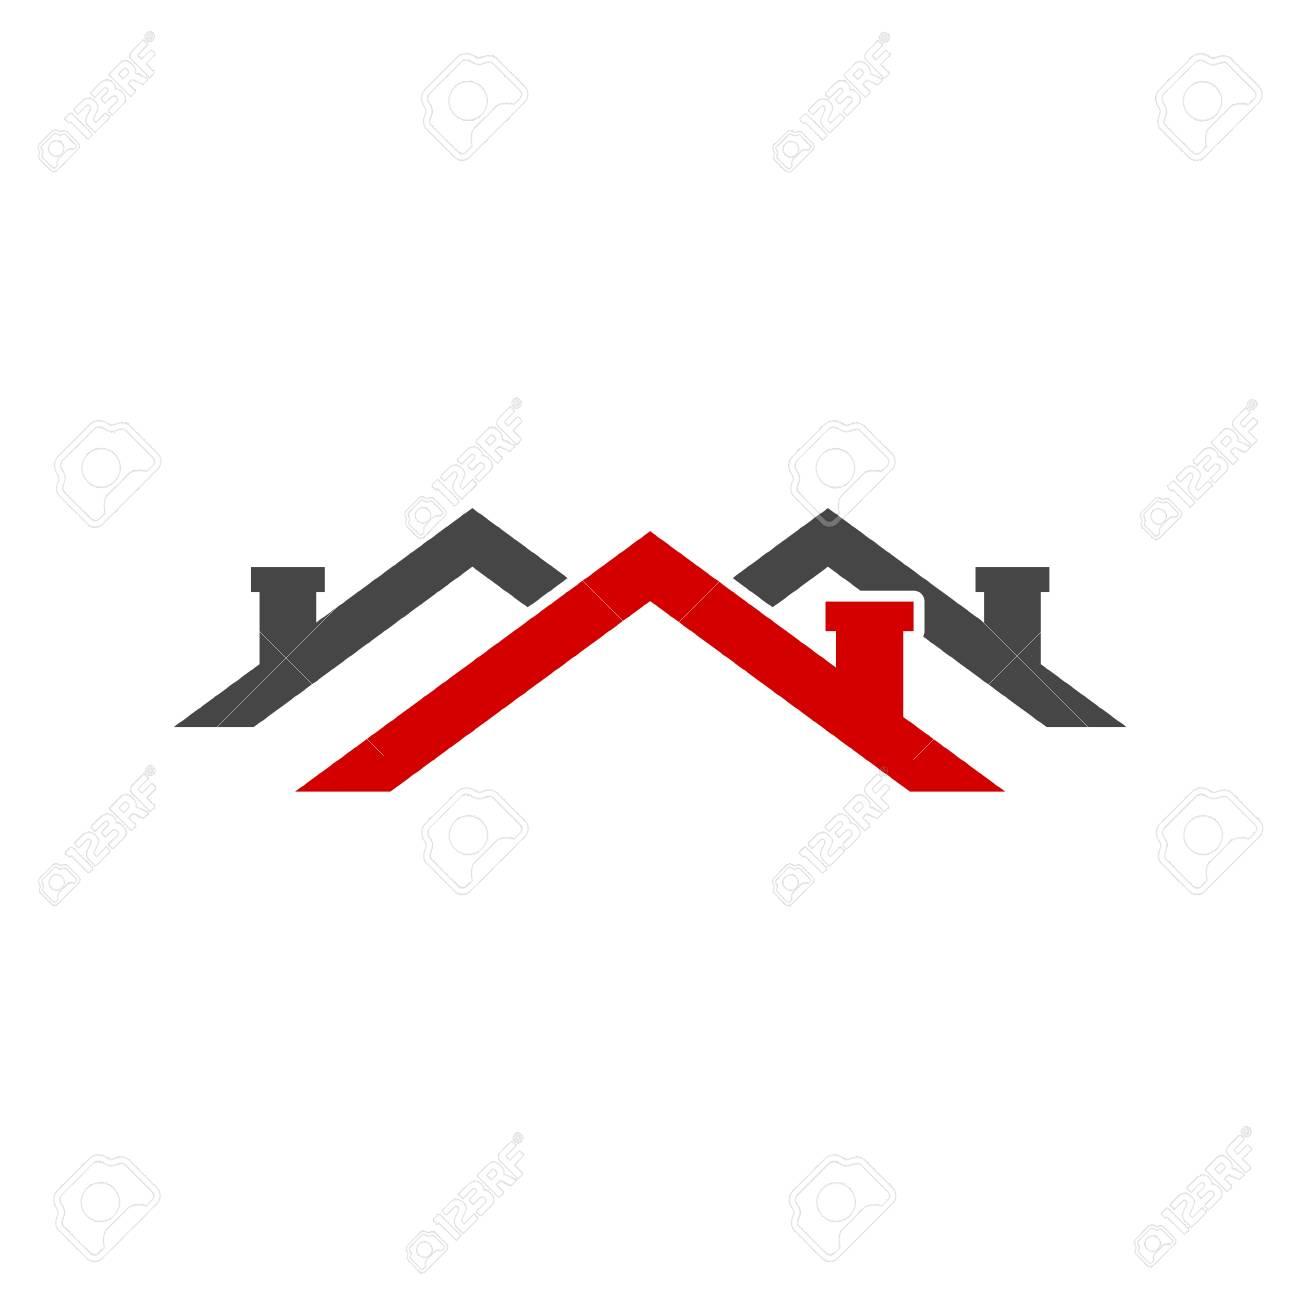 Home Roof Icon Lizenzfrei Nutzbare Vektorgrafiken Clip Arts